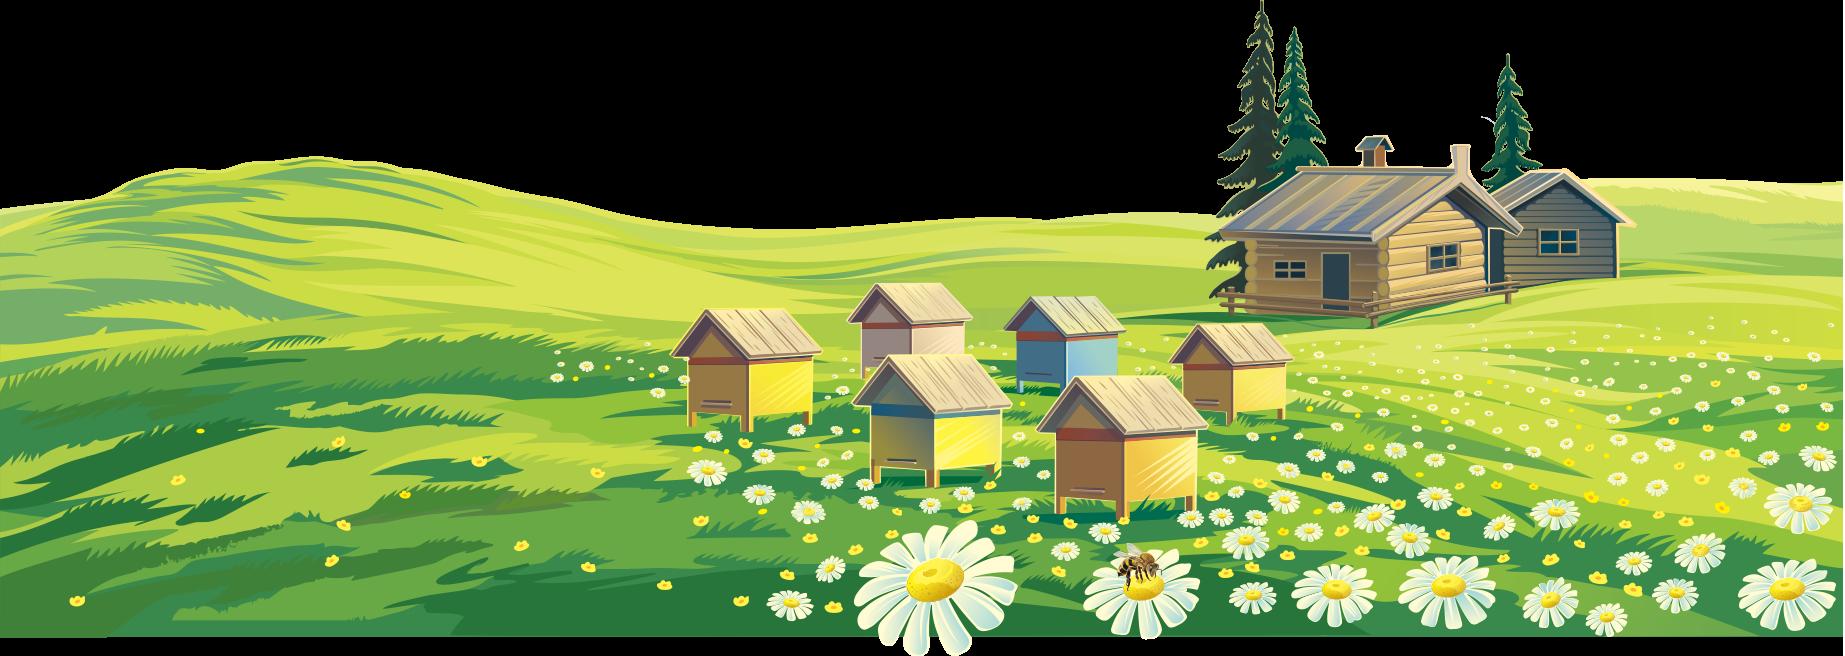 Farming clipart rural area. Bee landscape painting farm